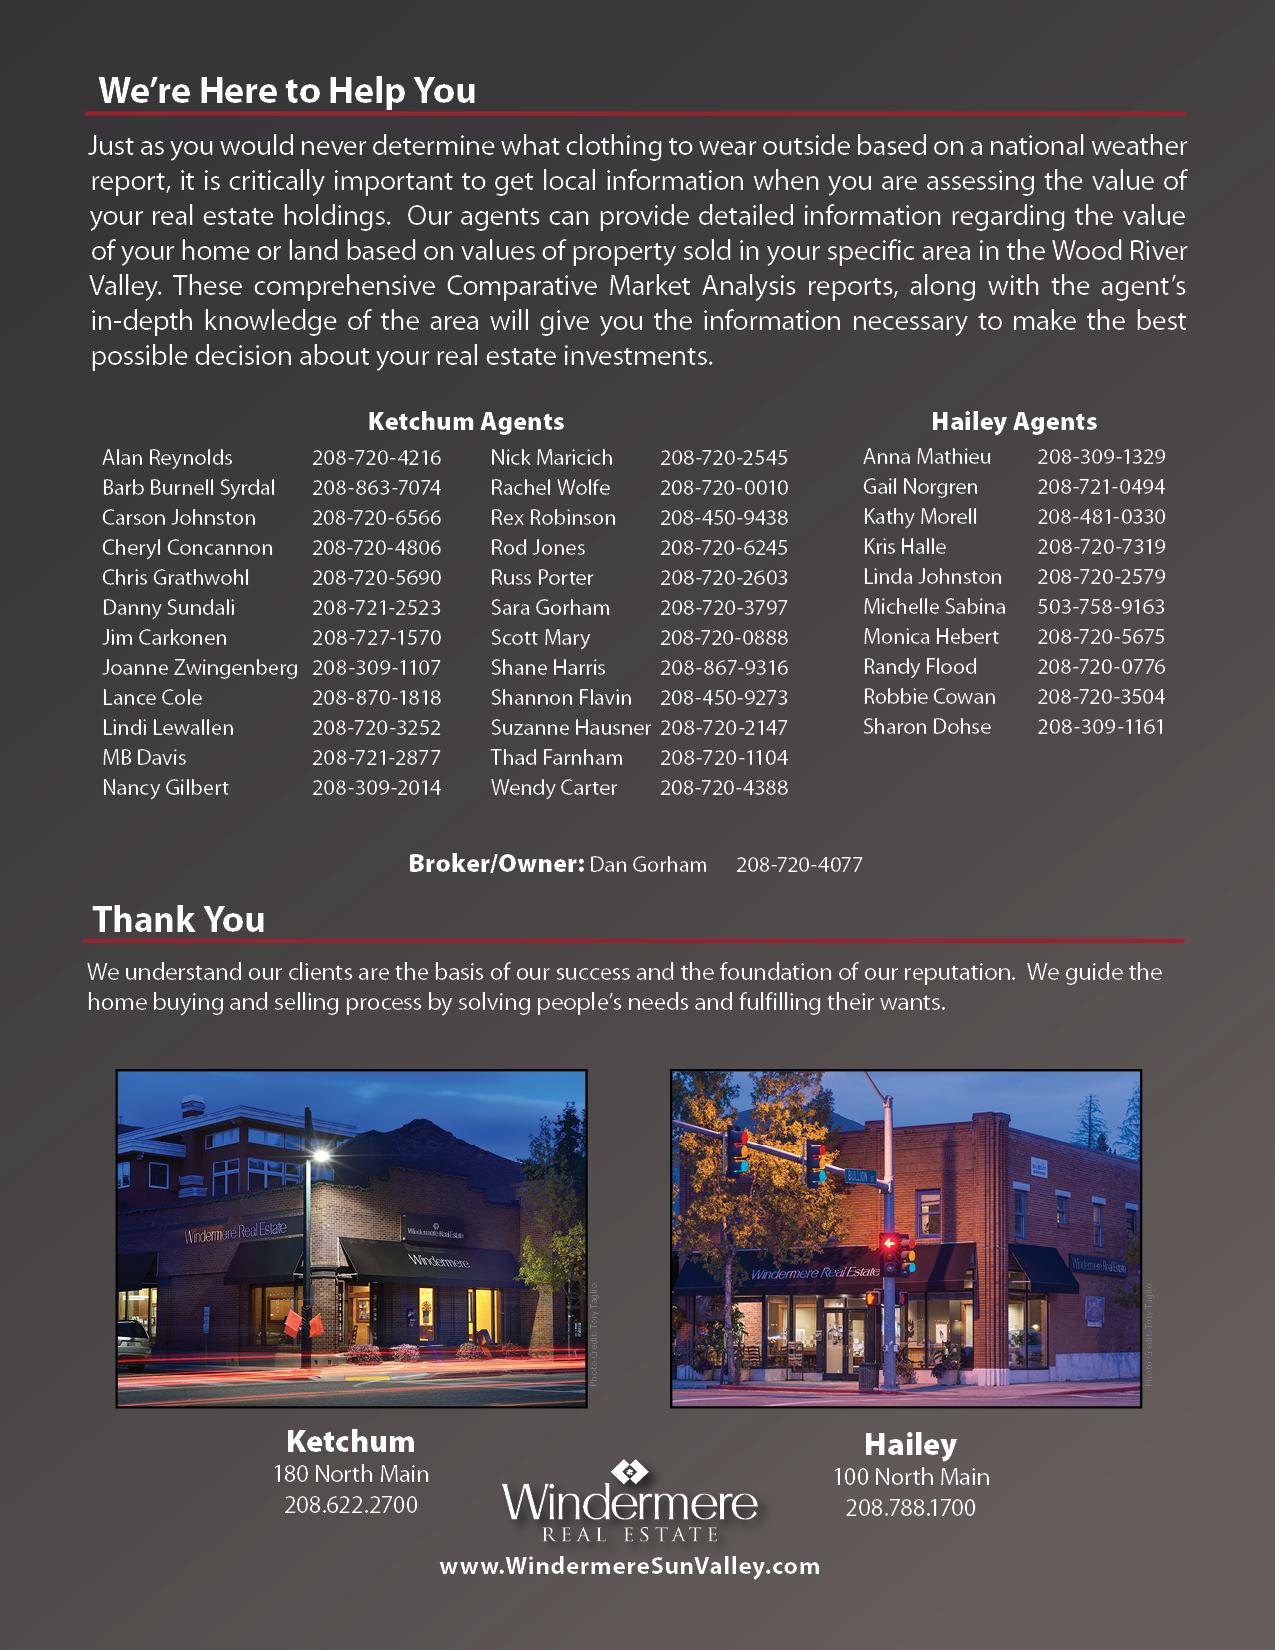 2017 Windermere Report - Real Estate